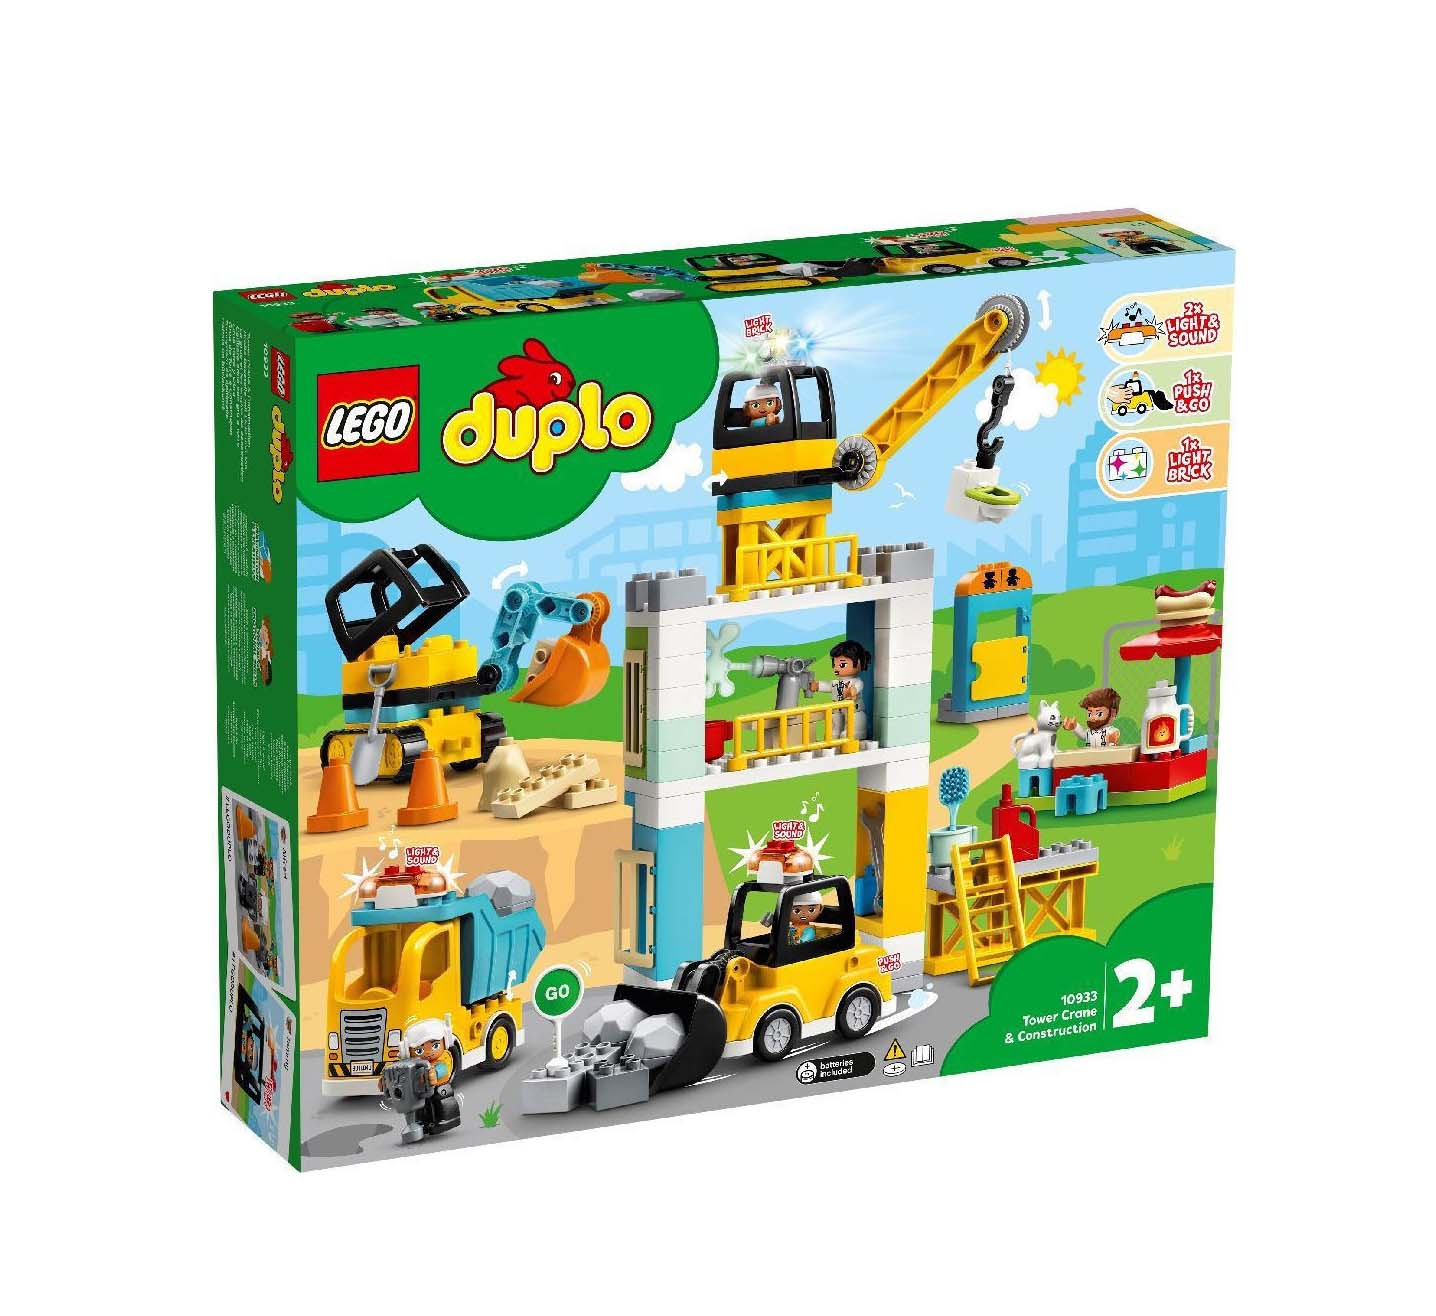 Lego Duplo: Tower Crane & Construction 10933